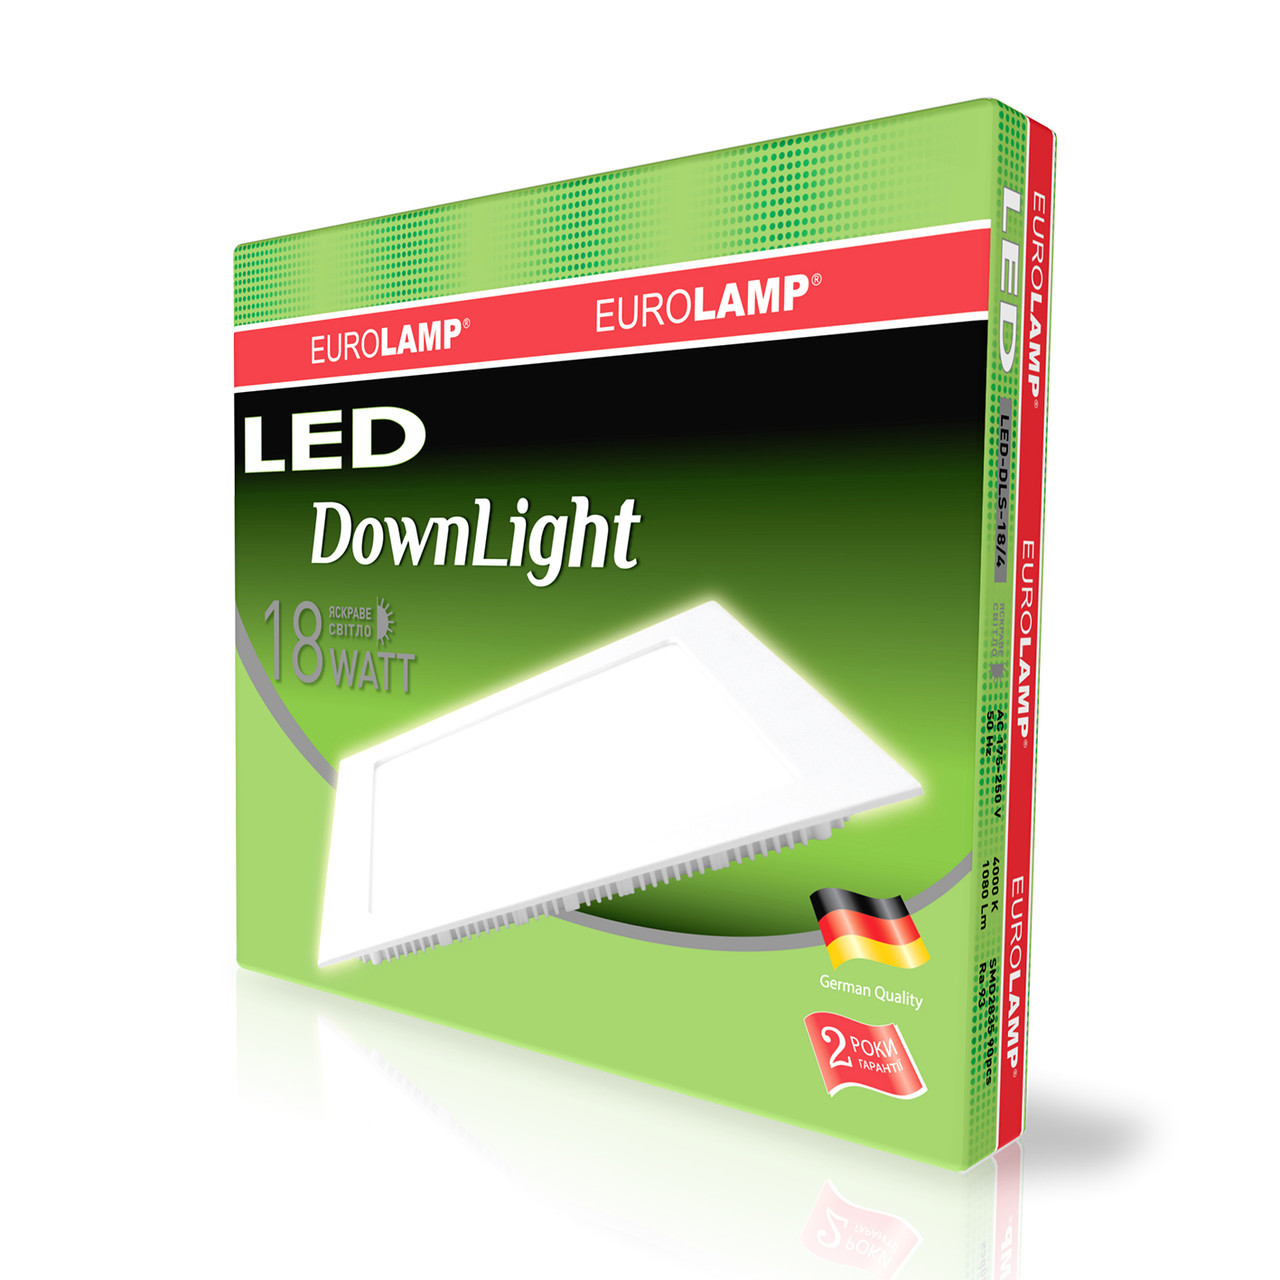 EUROLAMP LED Светильник квадратный Downlight 18W 4000K 220V